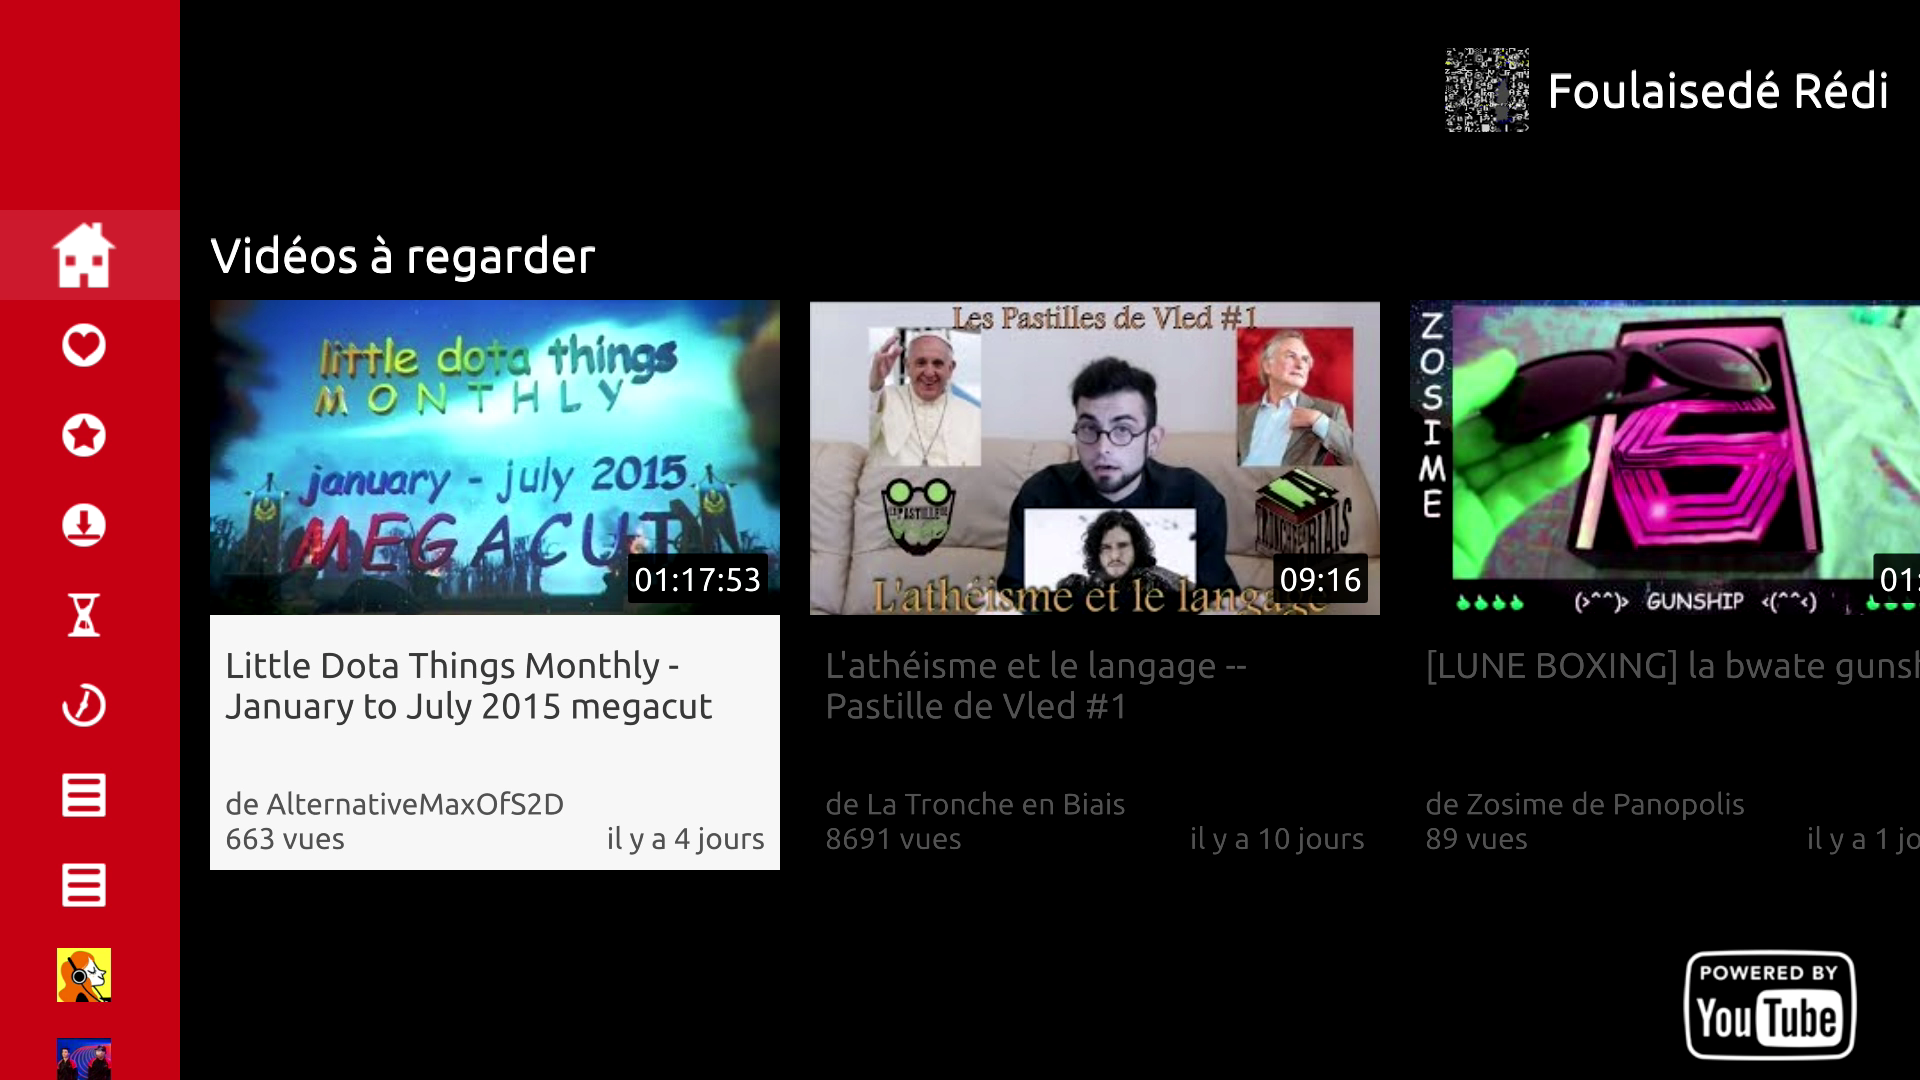 Aperçu De Twitch, YouTube Et Dailymotion Sur Freebox Player